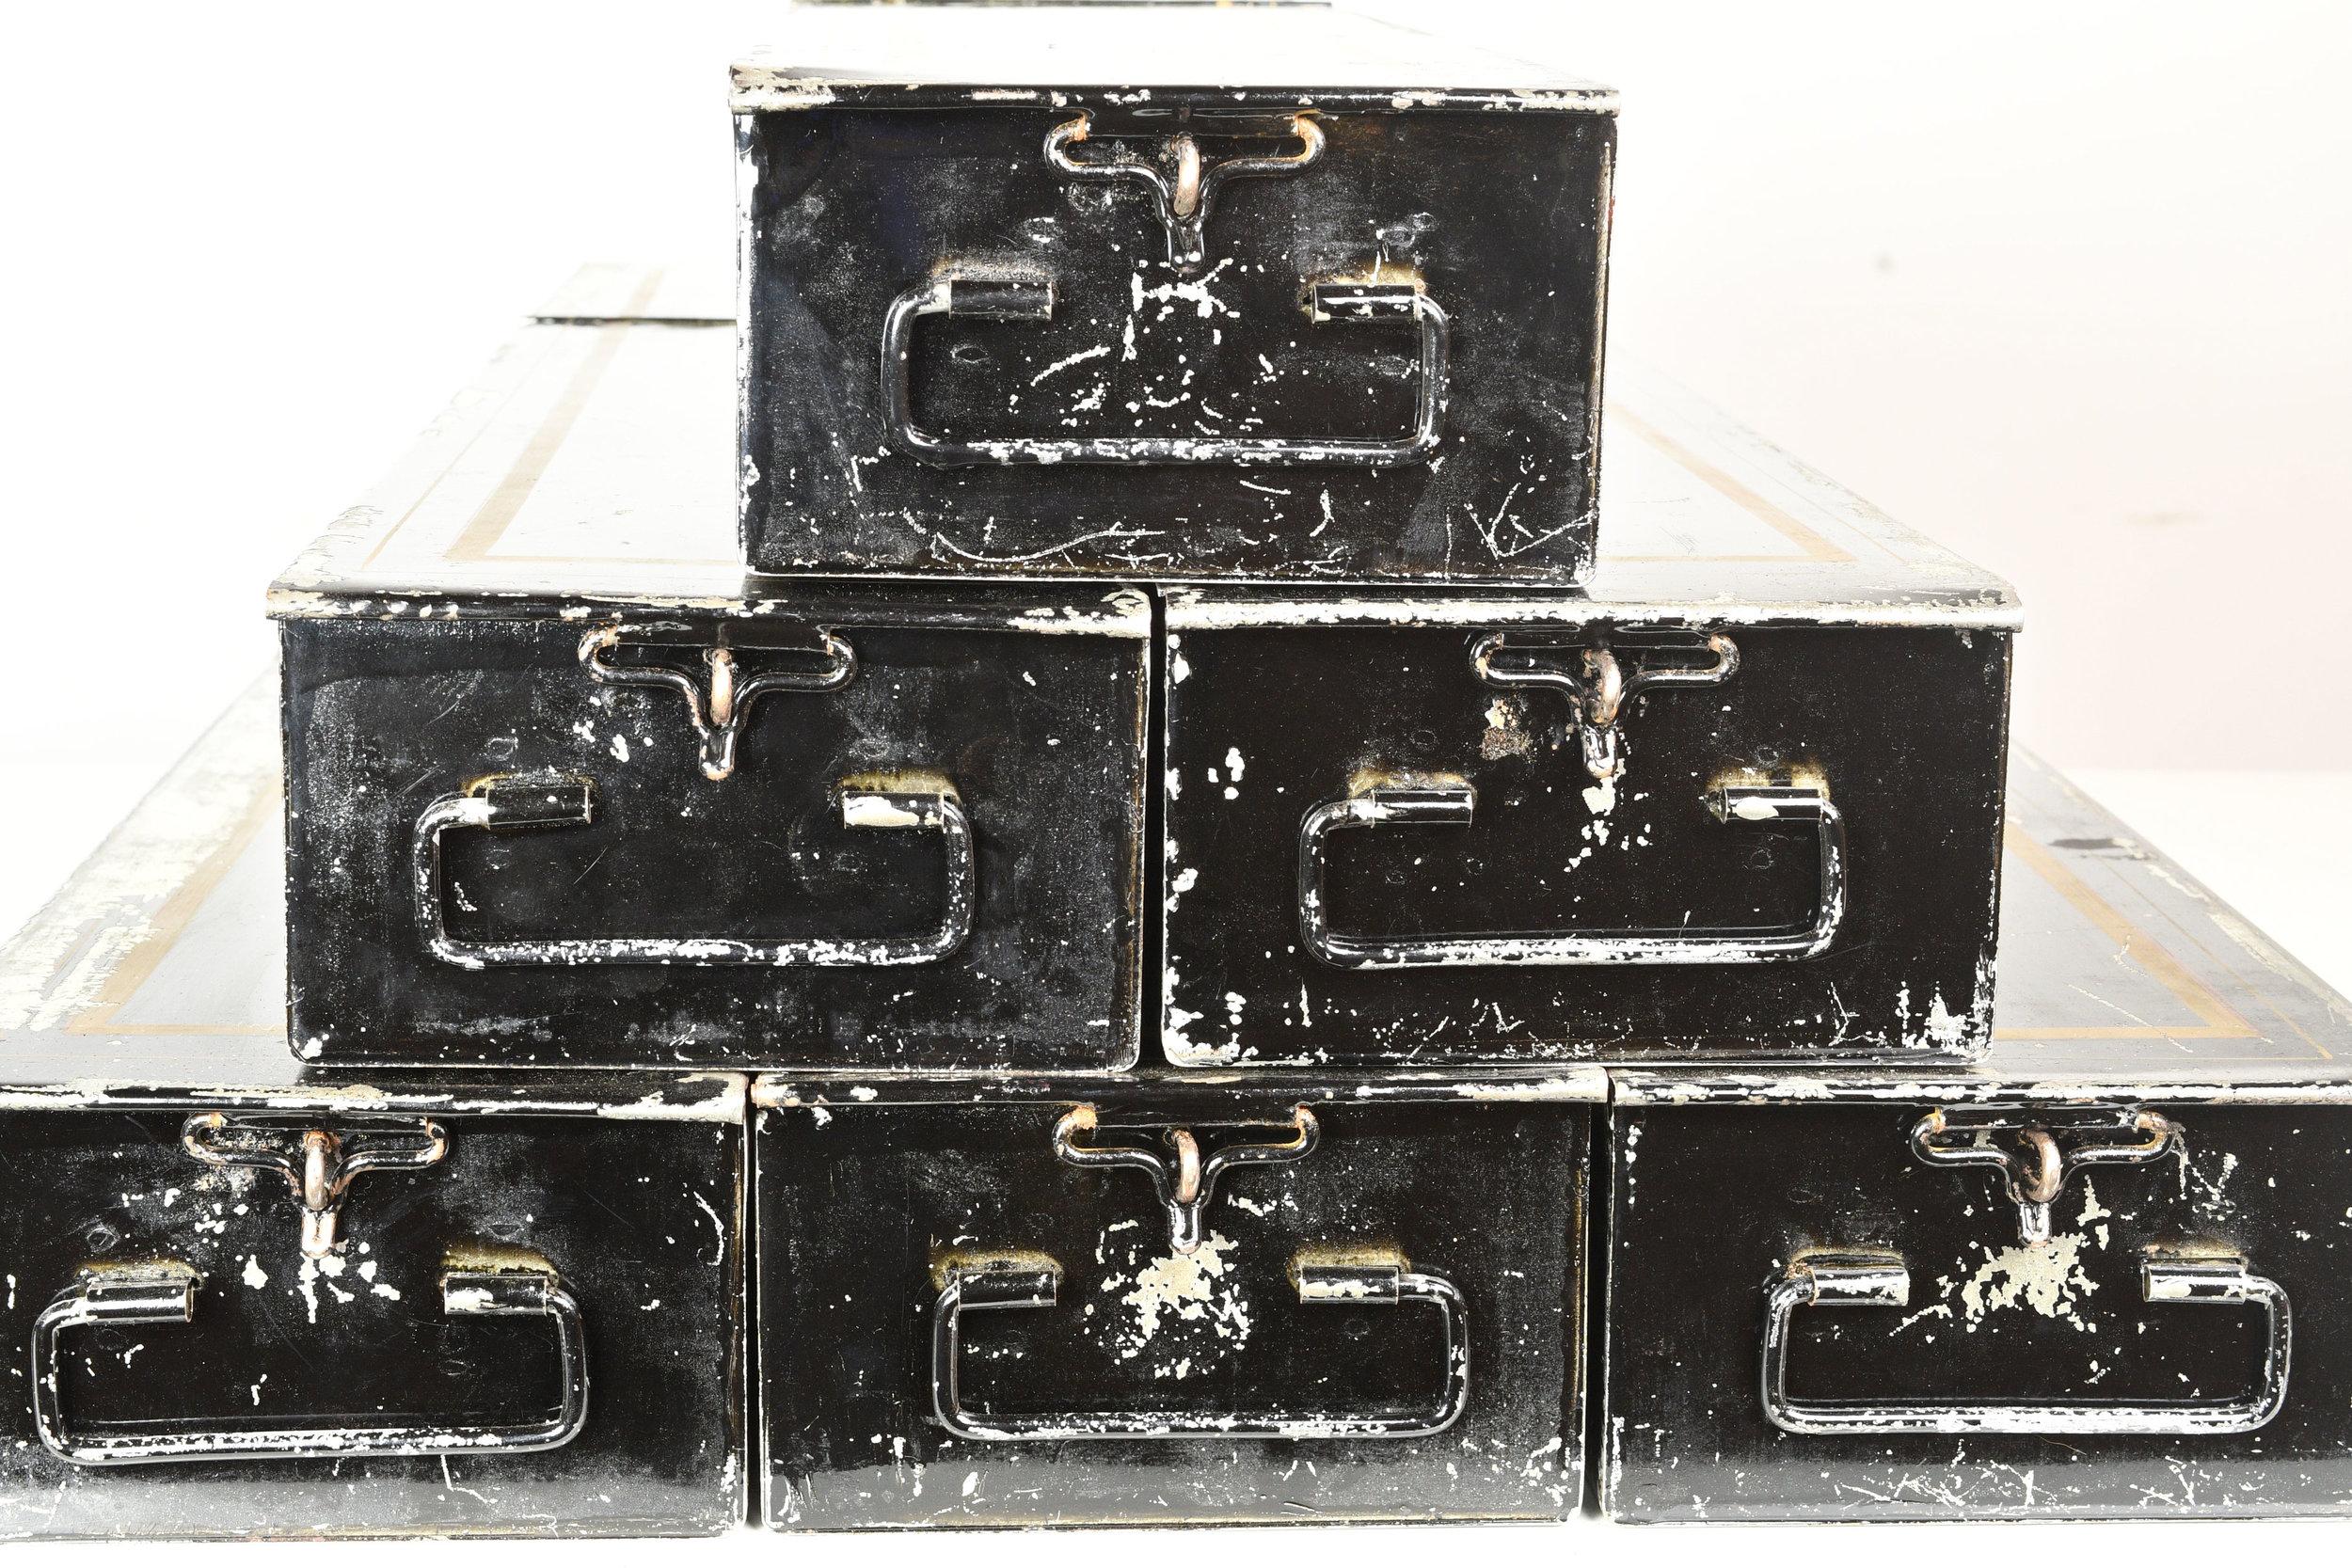 47863-safety-deposit-box-group.jpg